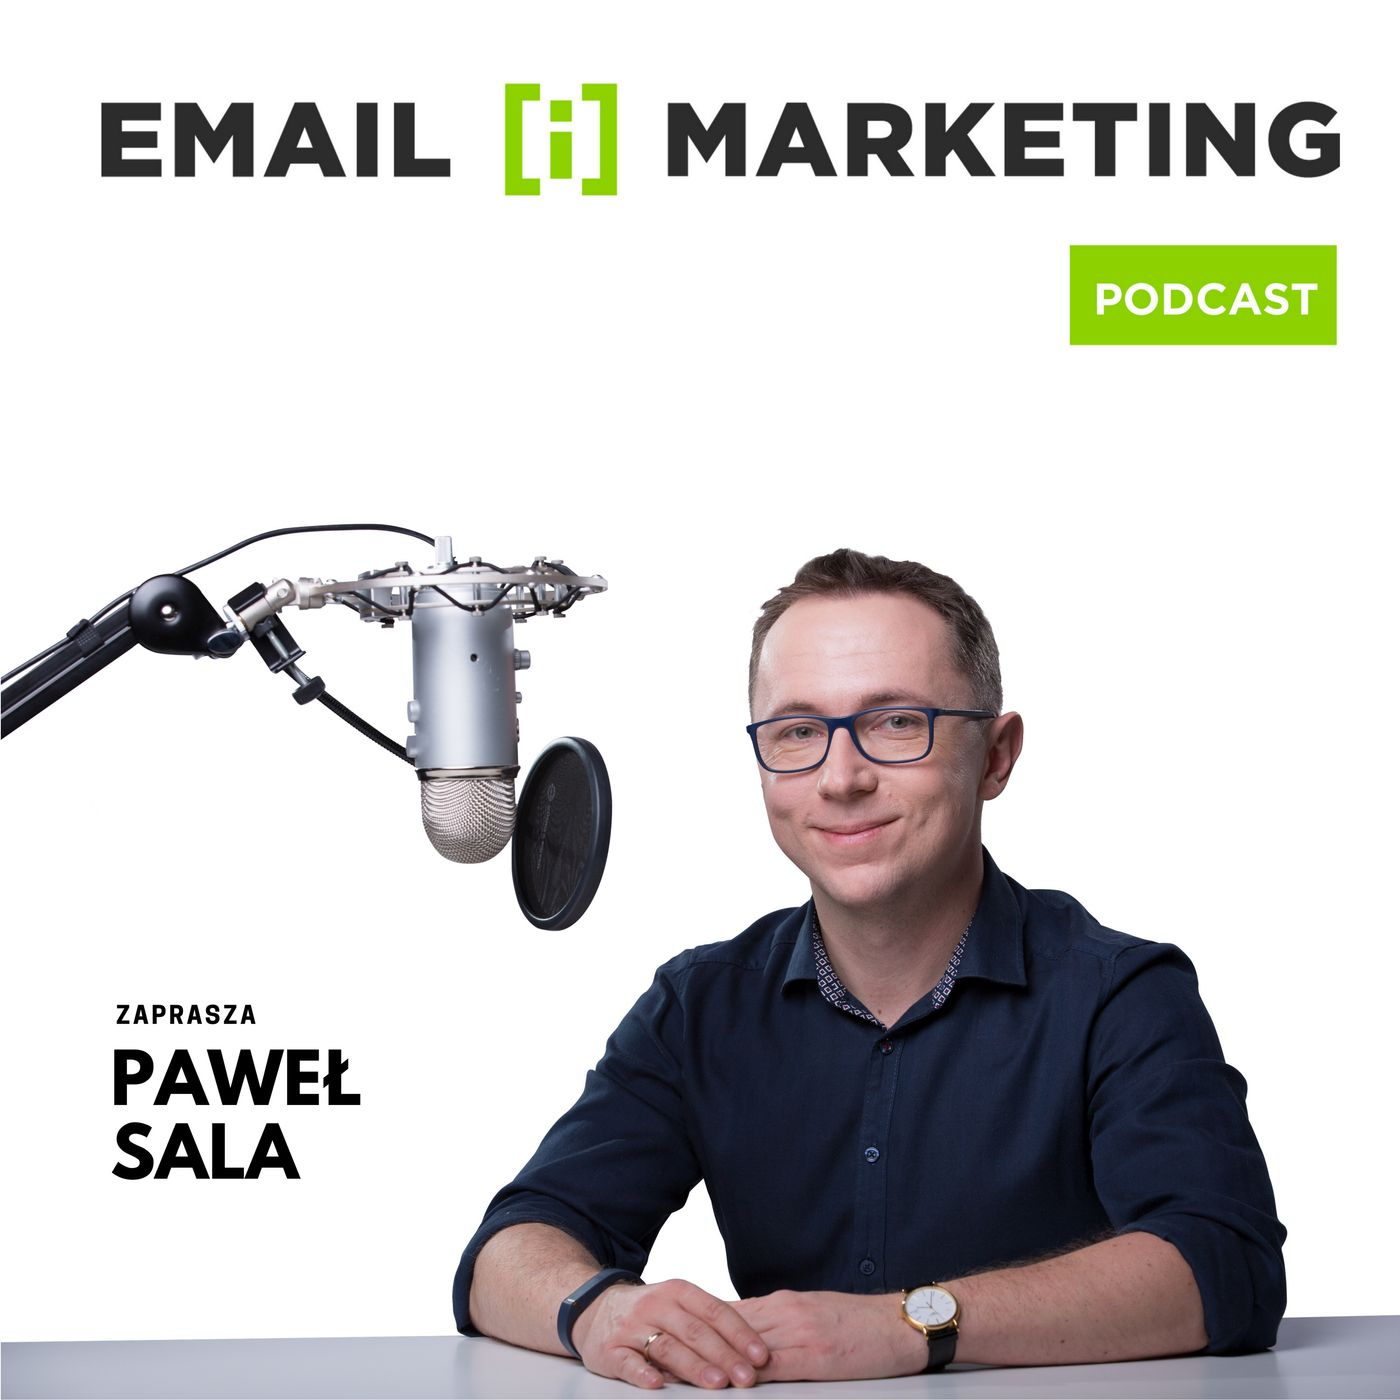 Email [i] Marketing Podcast